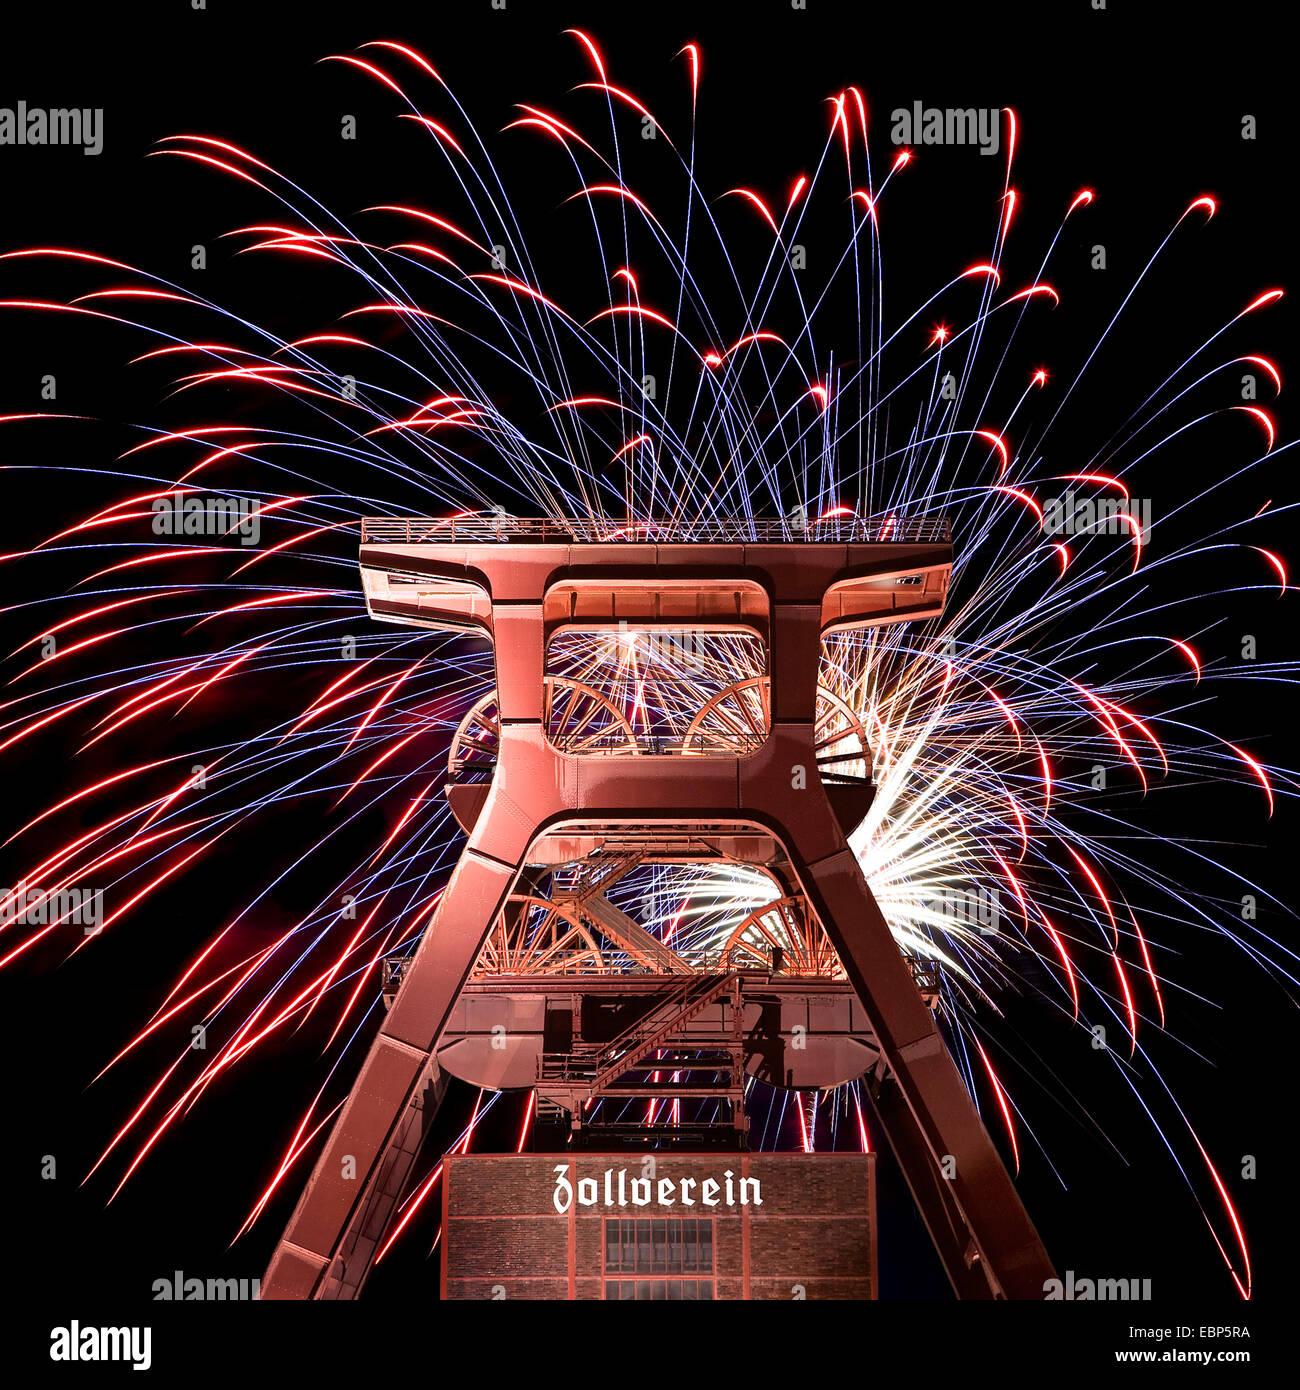 fireworks at Zollverein Coal Mine Industrial Complex at night, Germany, North Rhine-Westphalia, Ruhr Area, Essen - Stock Image